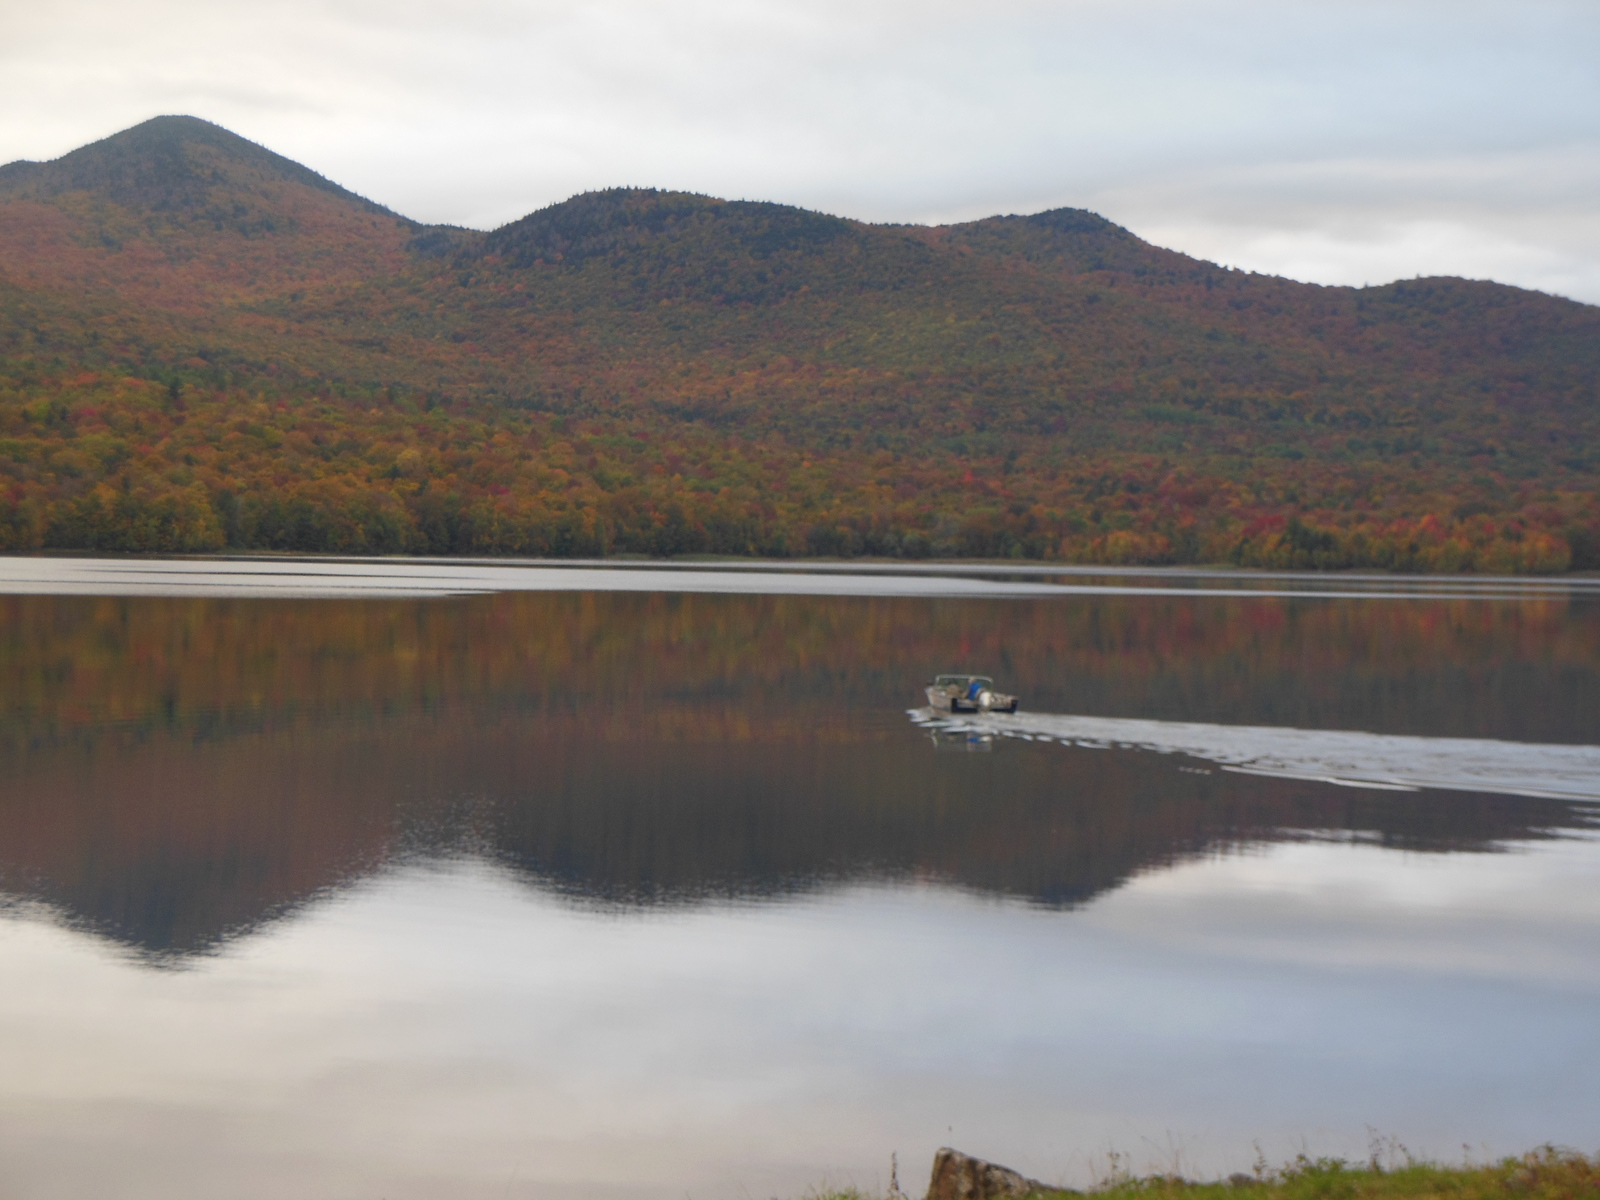 Boat crossing the reservoir